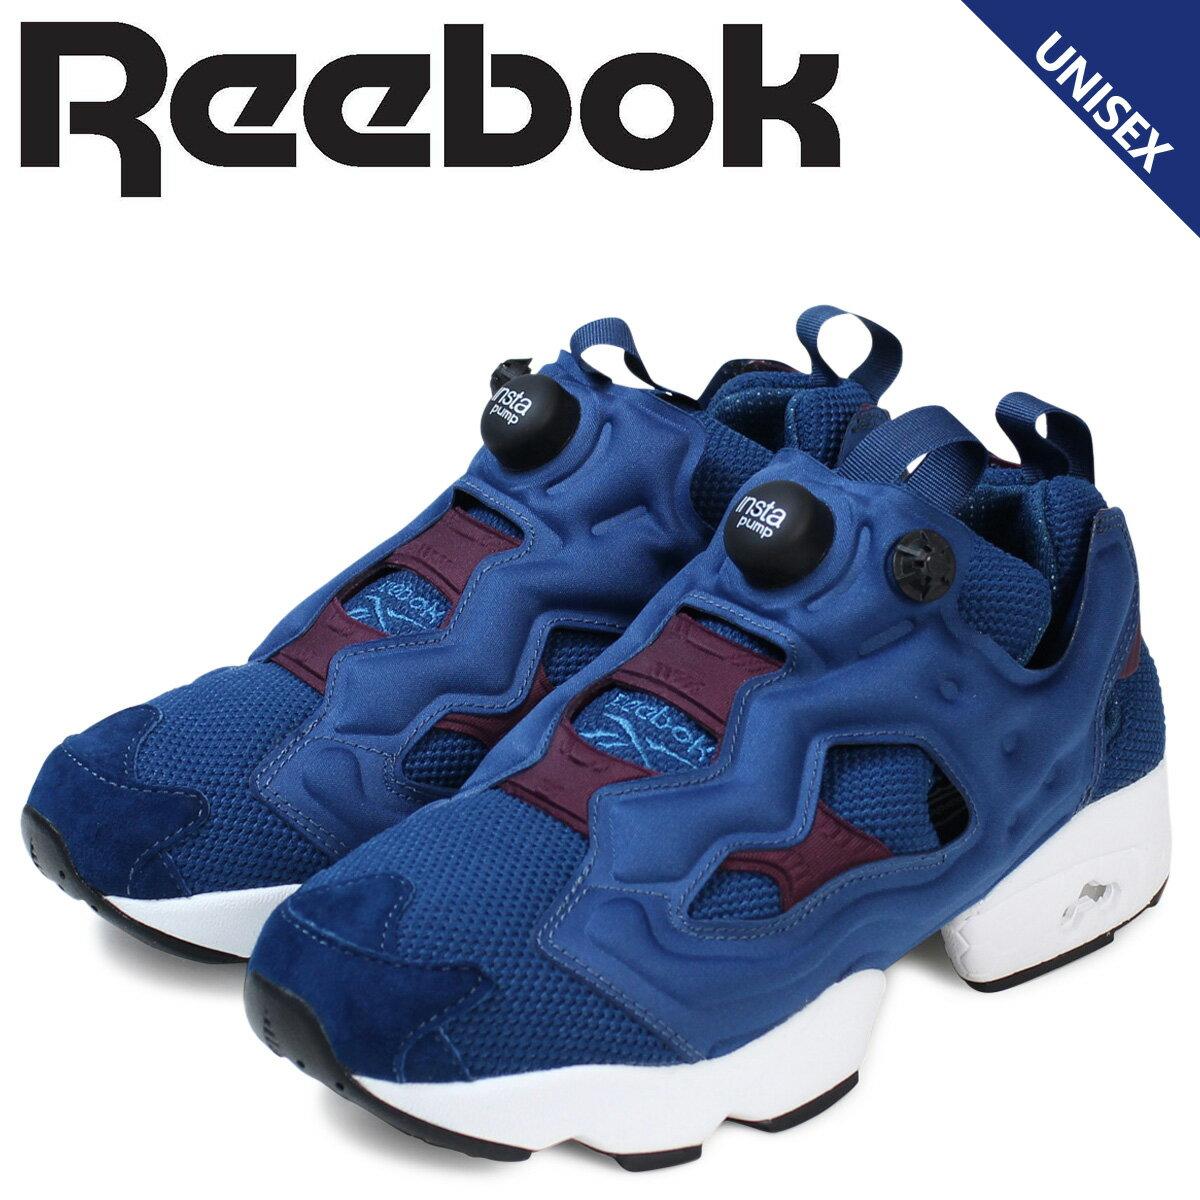 Reebok リーボック ポンプフューリー スニーカー INSTAPUMP FURY HK AR2533 メンズ レディース 靴 ブルー